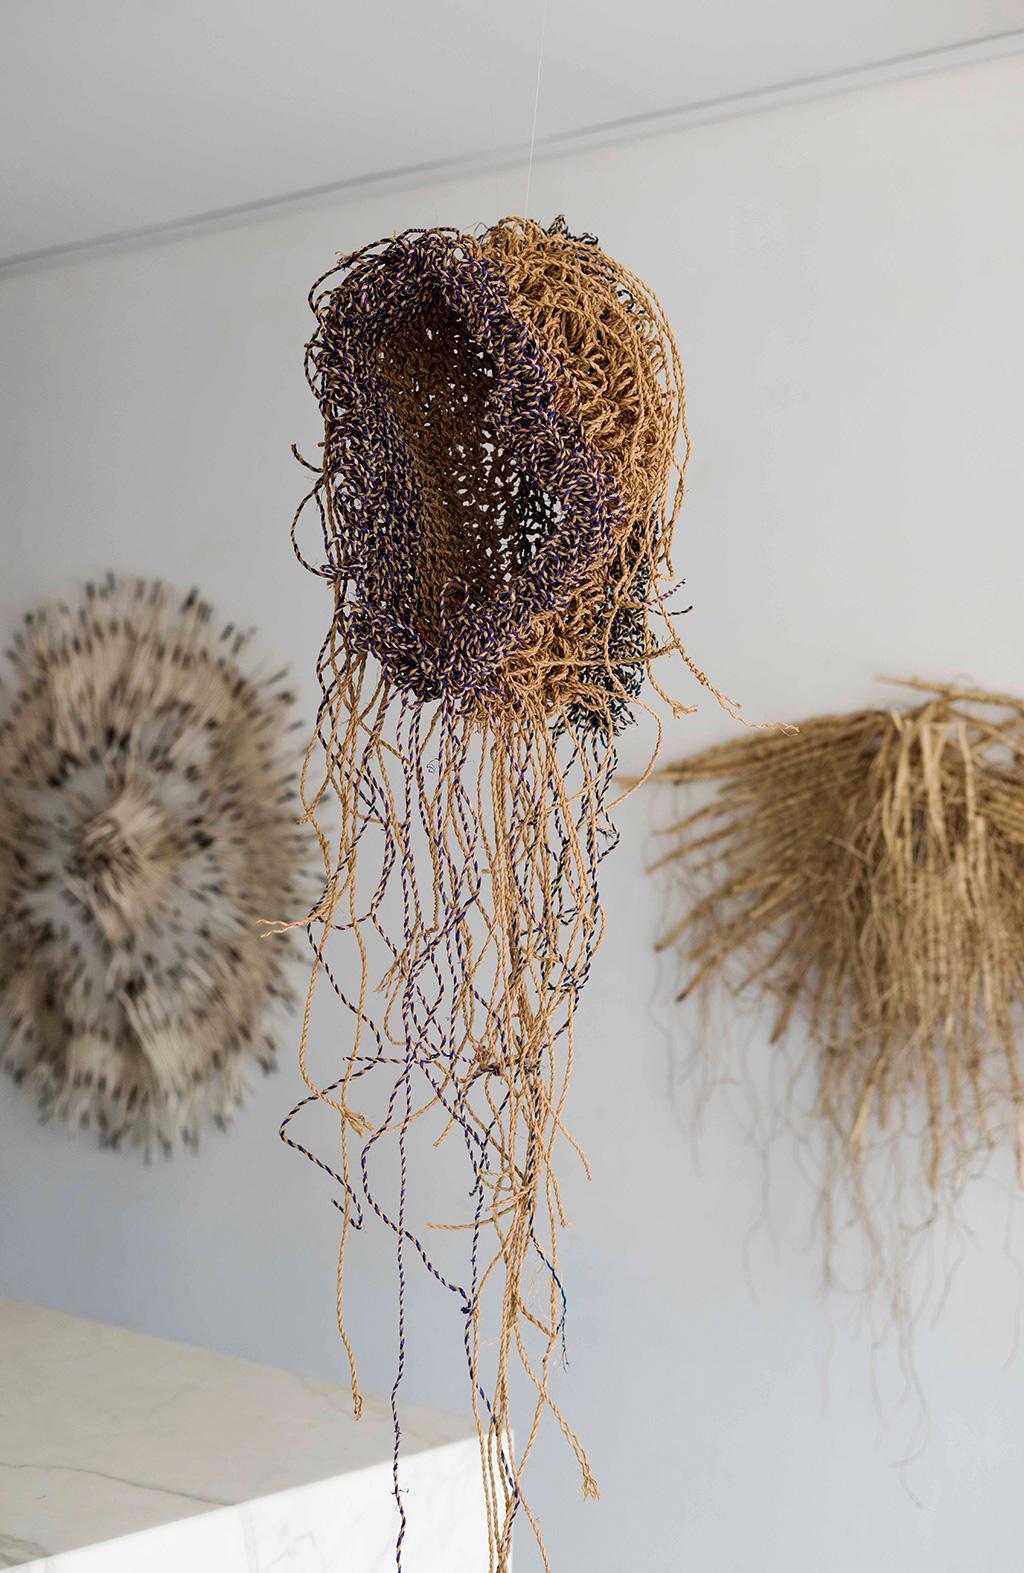 Lionfish,-Raffia,-wire,-185x25x20cm-Basket-Depth-38cm,-$5800